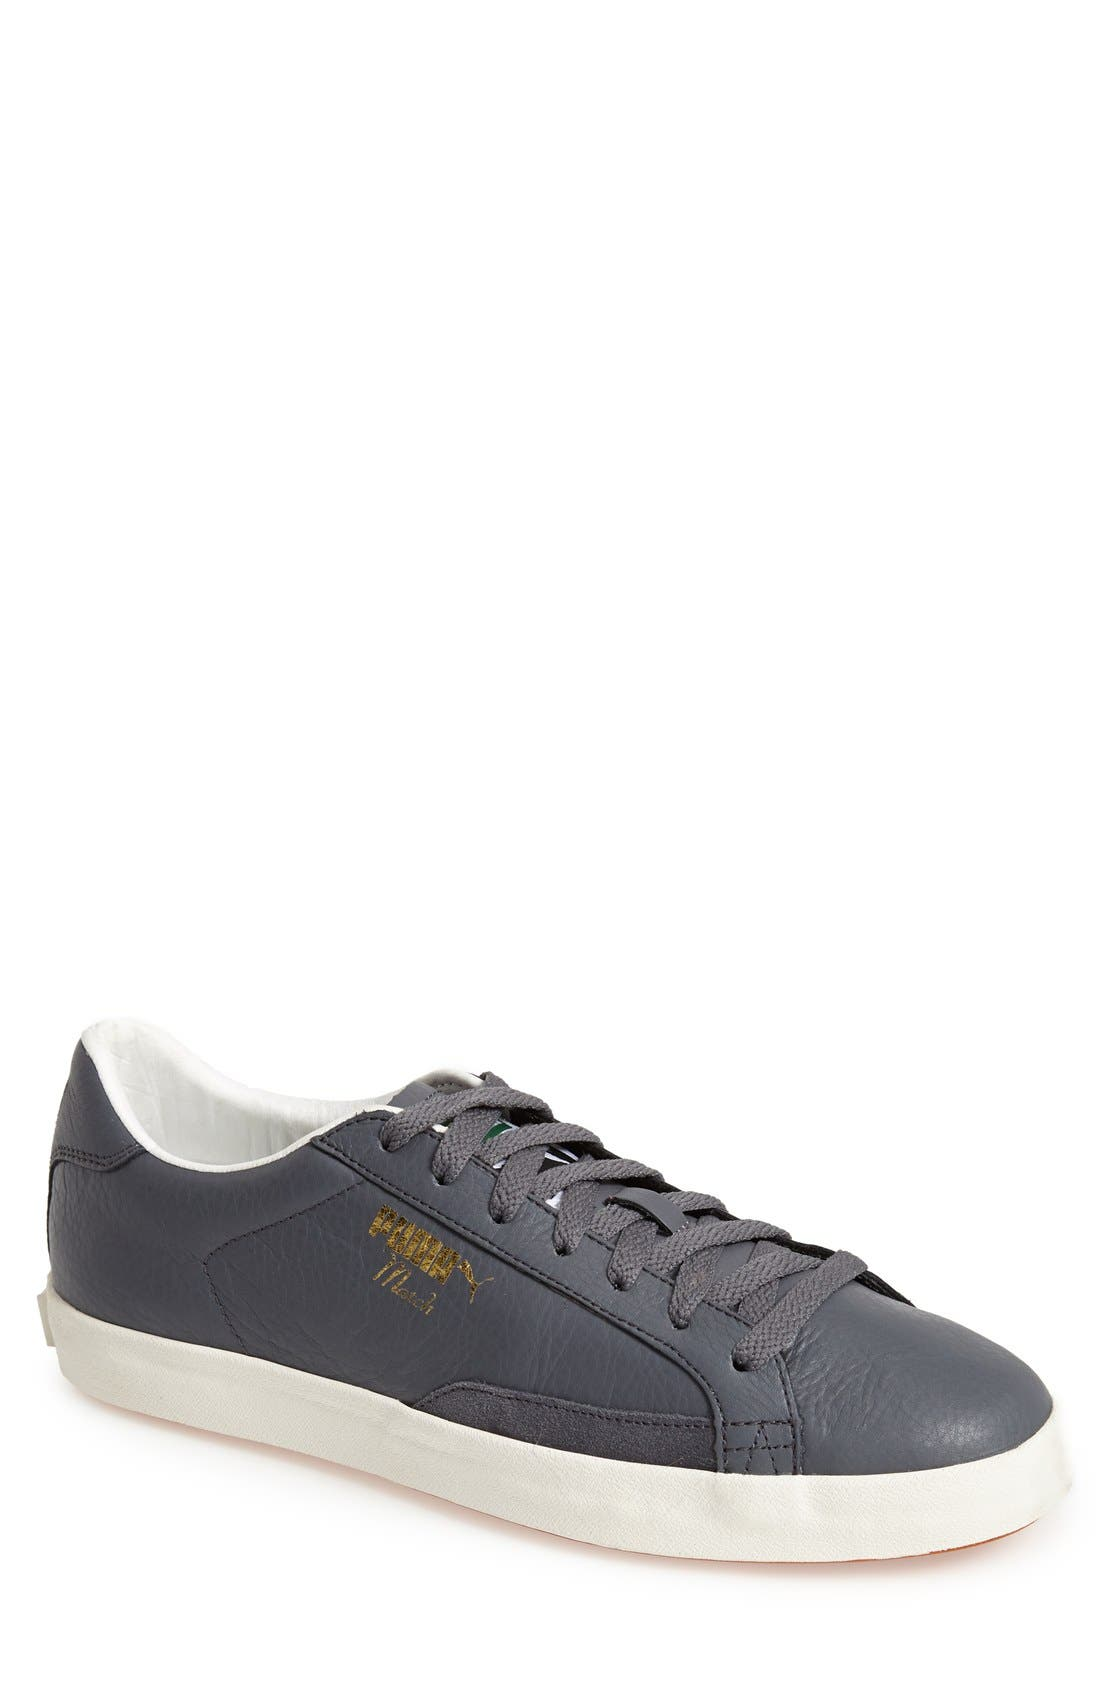 online retailer 0e901 ed6be Leather Sneaker Vulc   match Puma Nordstrom men xS8Azzn0